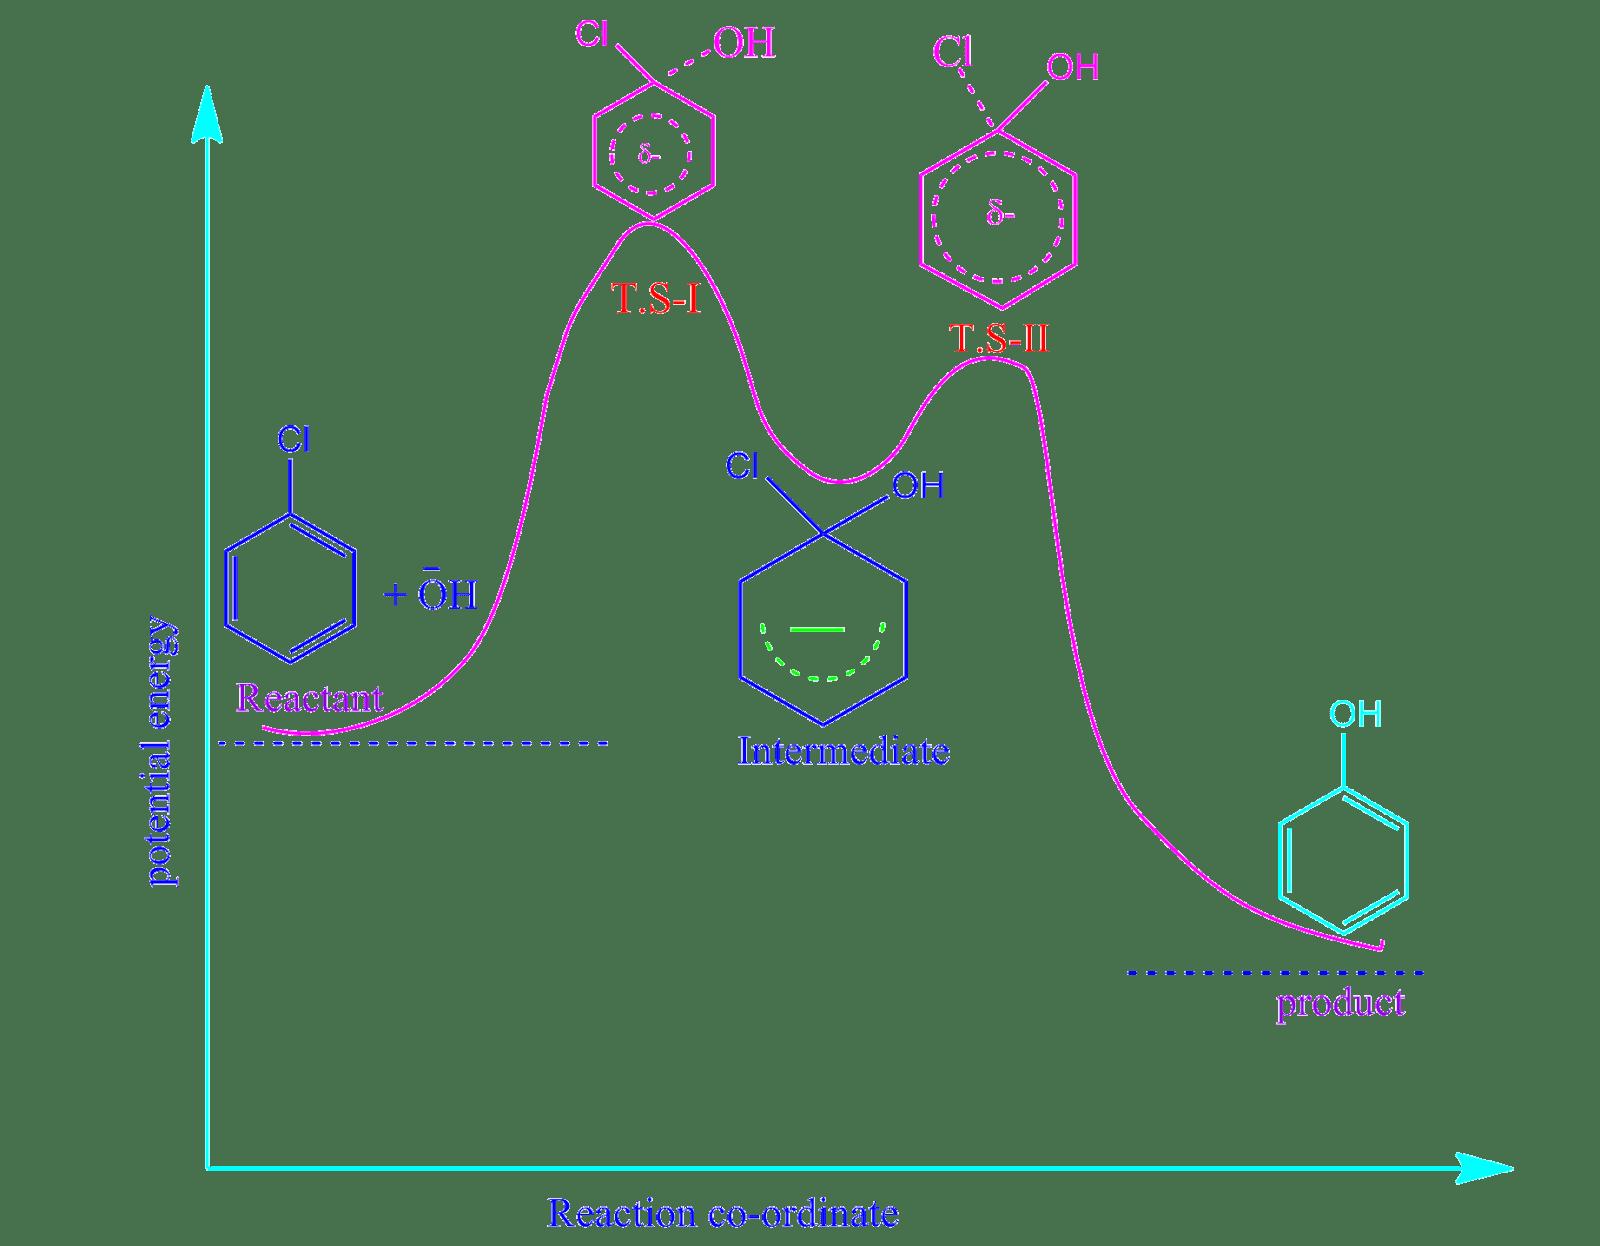 medium resolution of  iii addition elimination reaction mechanism